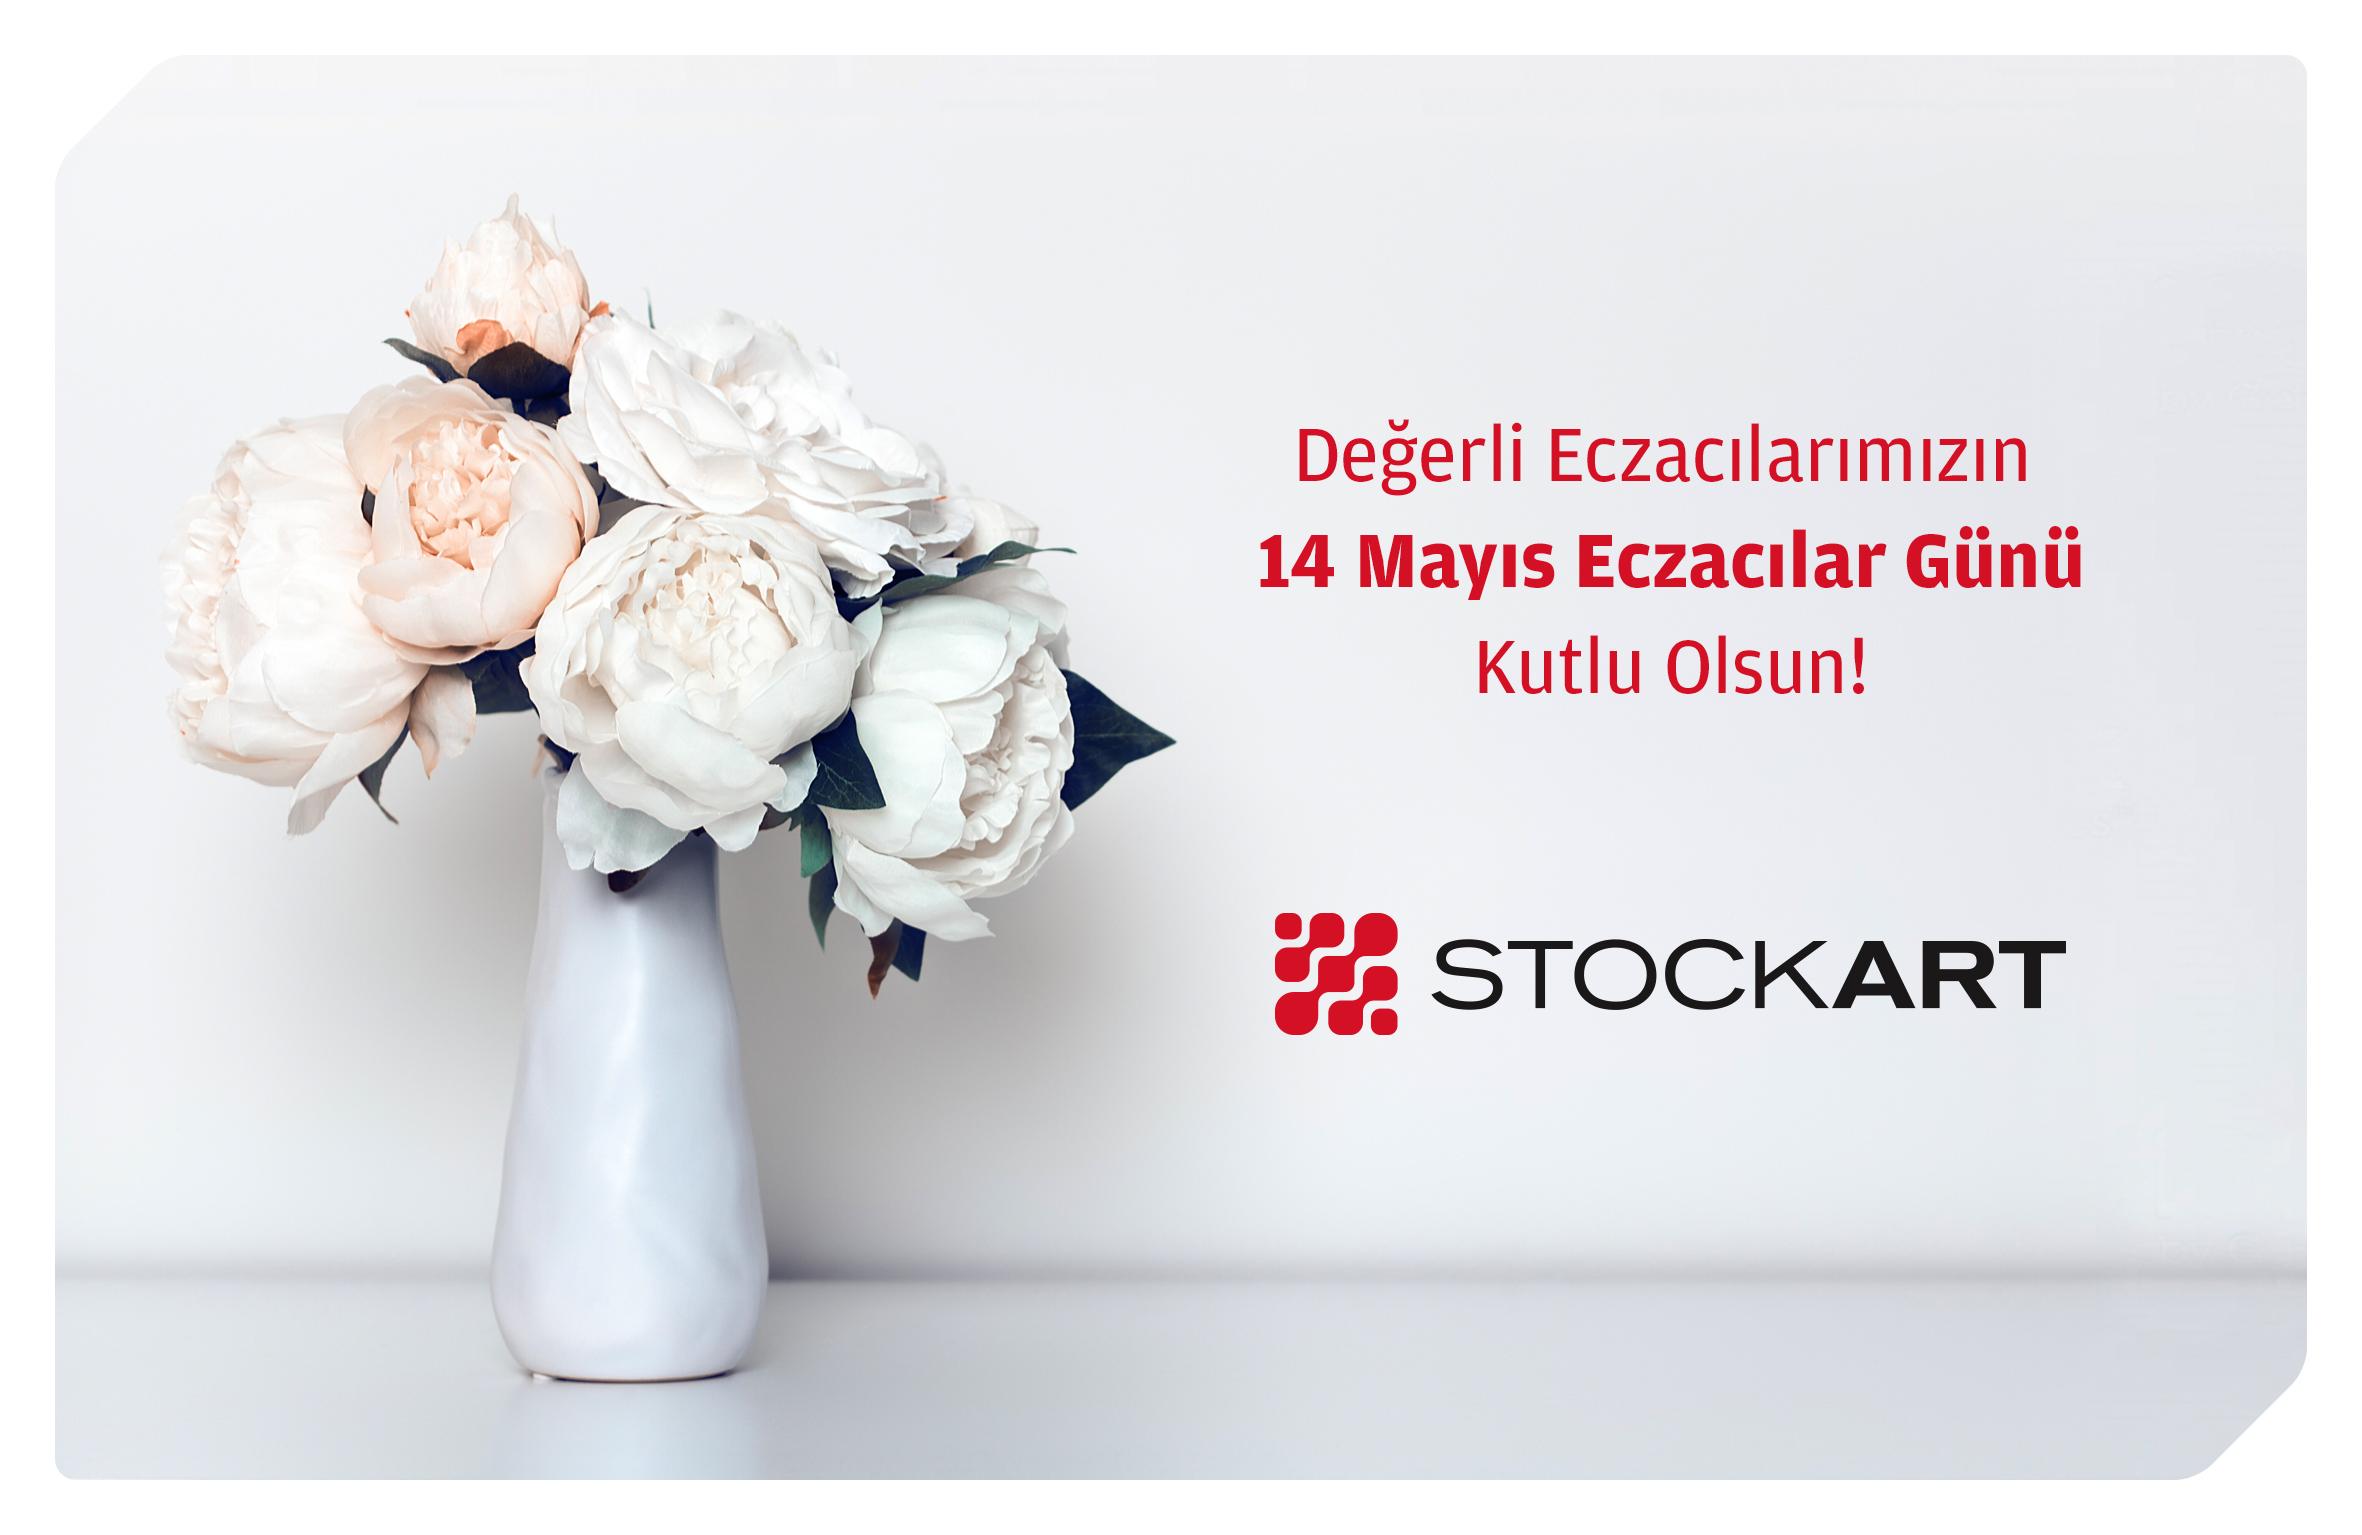 Stockart_Eczacilar_Gunu_2017_2.2